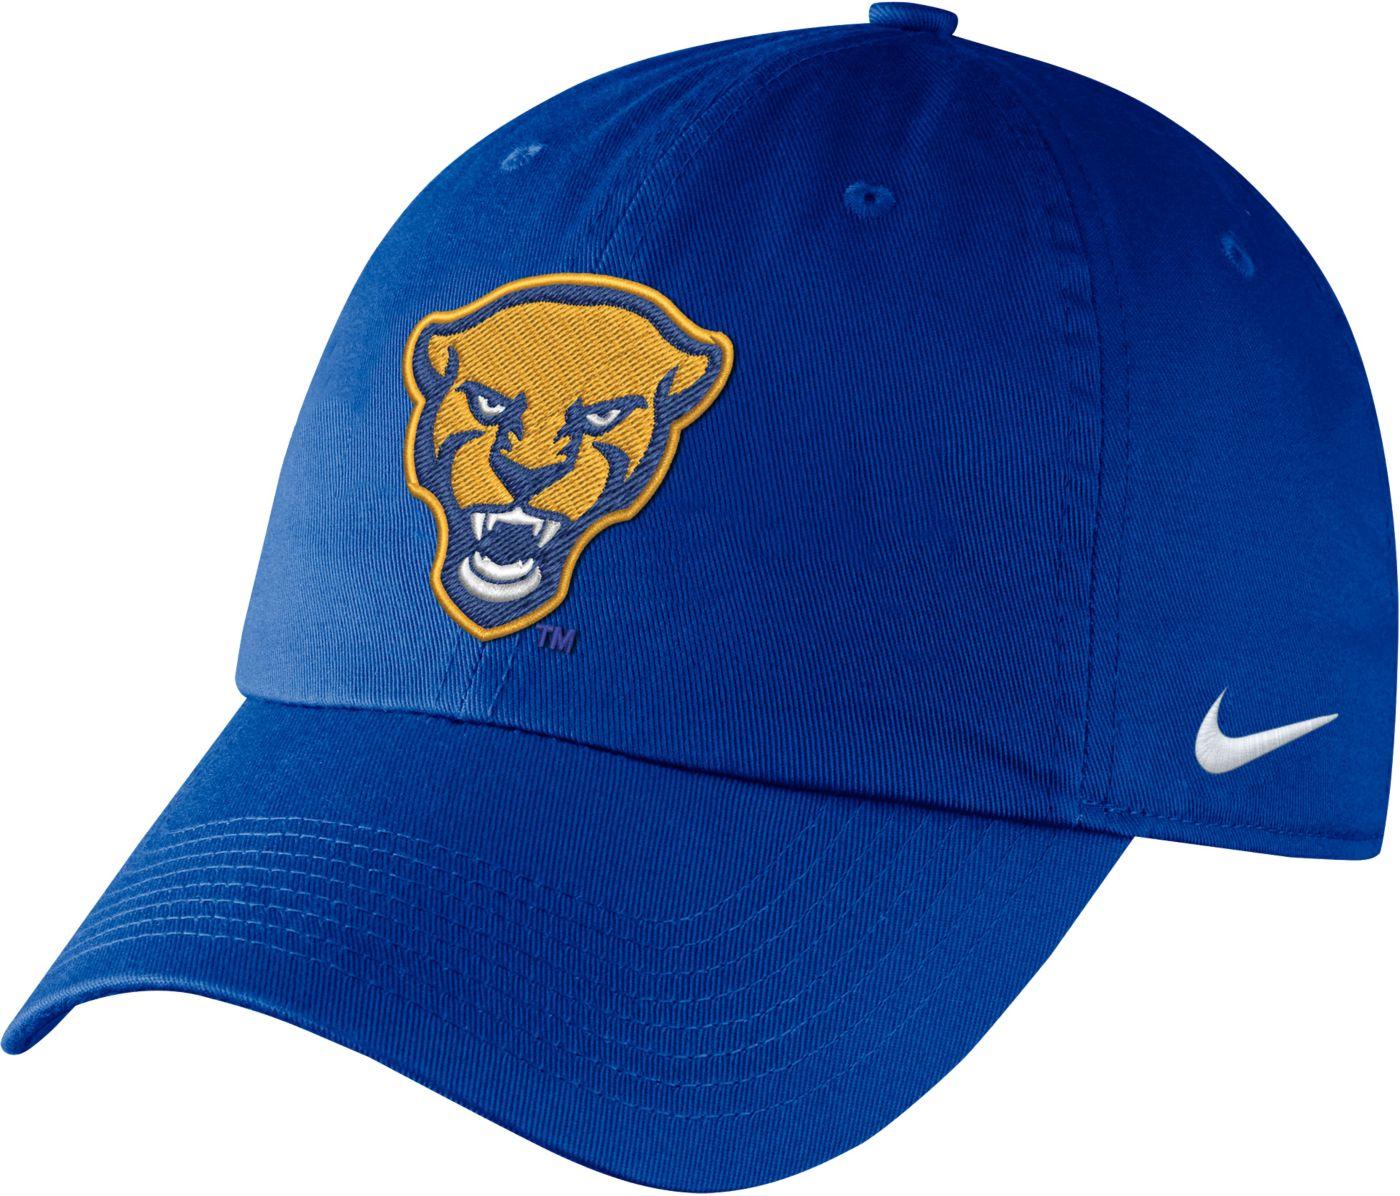 Nike Men's Pitt Panthers Blue Unstructured Adjustable Hat